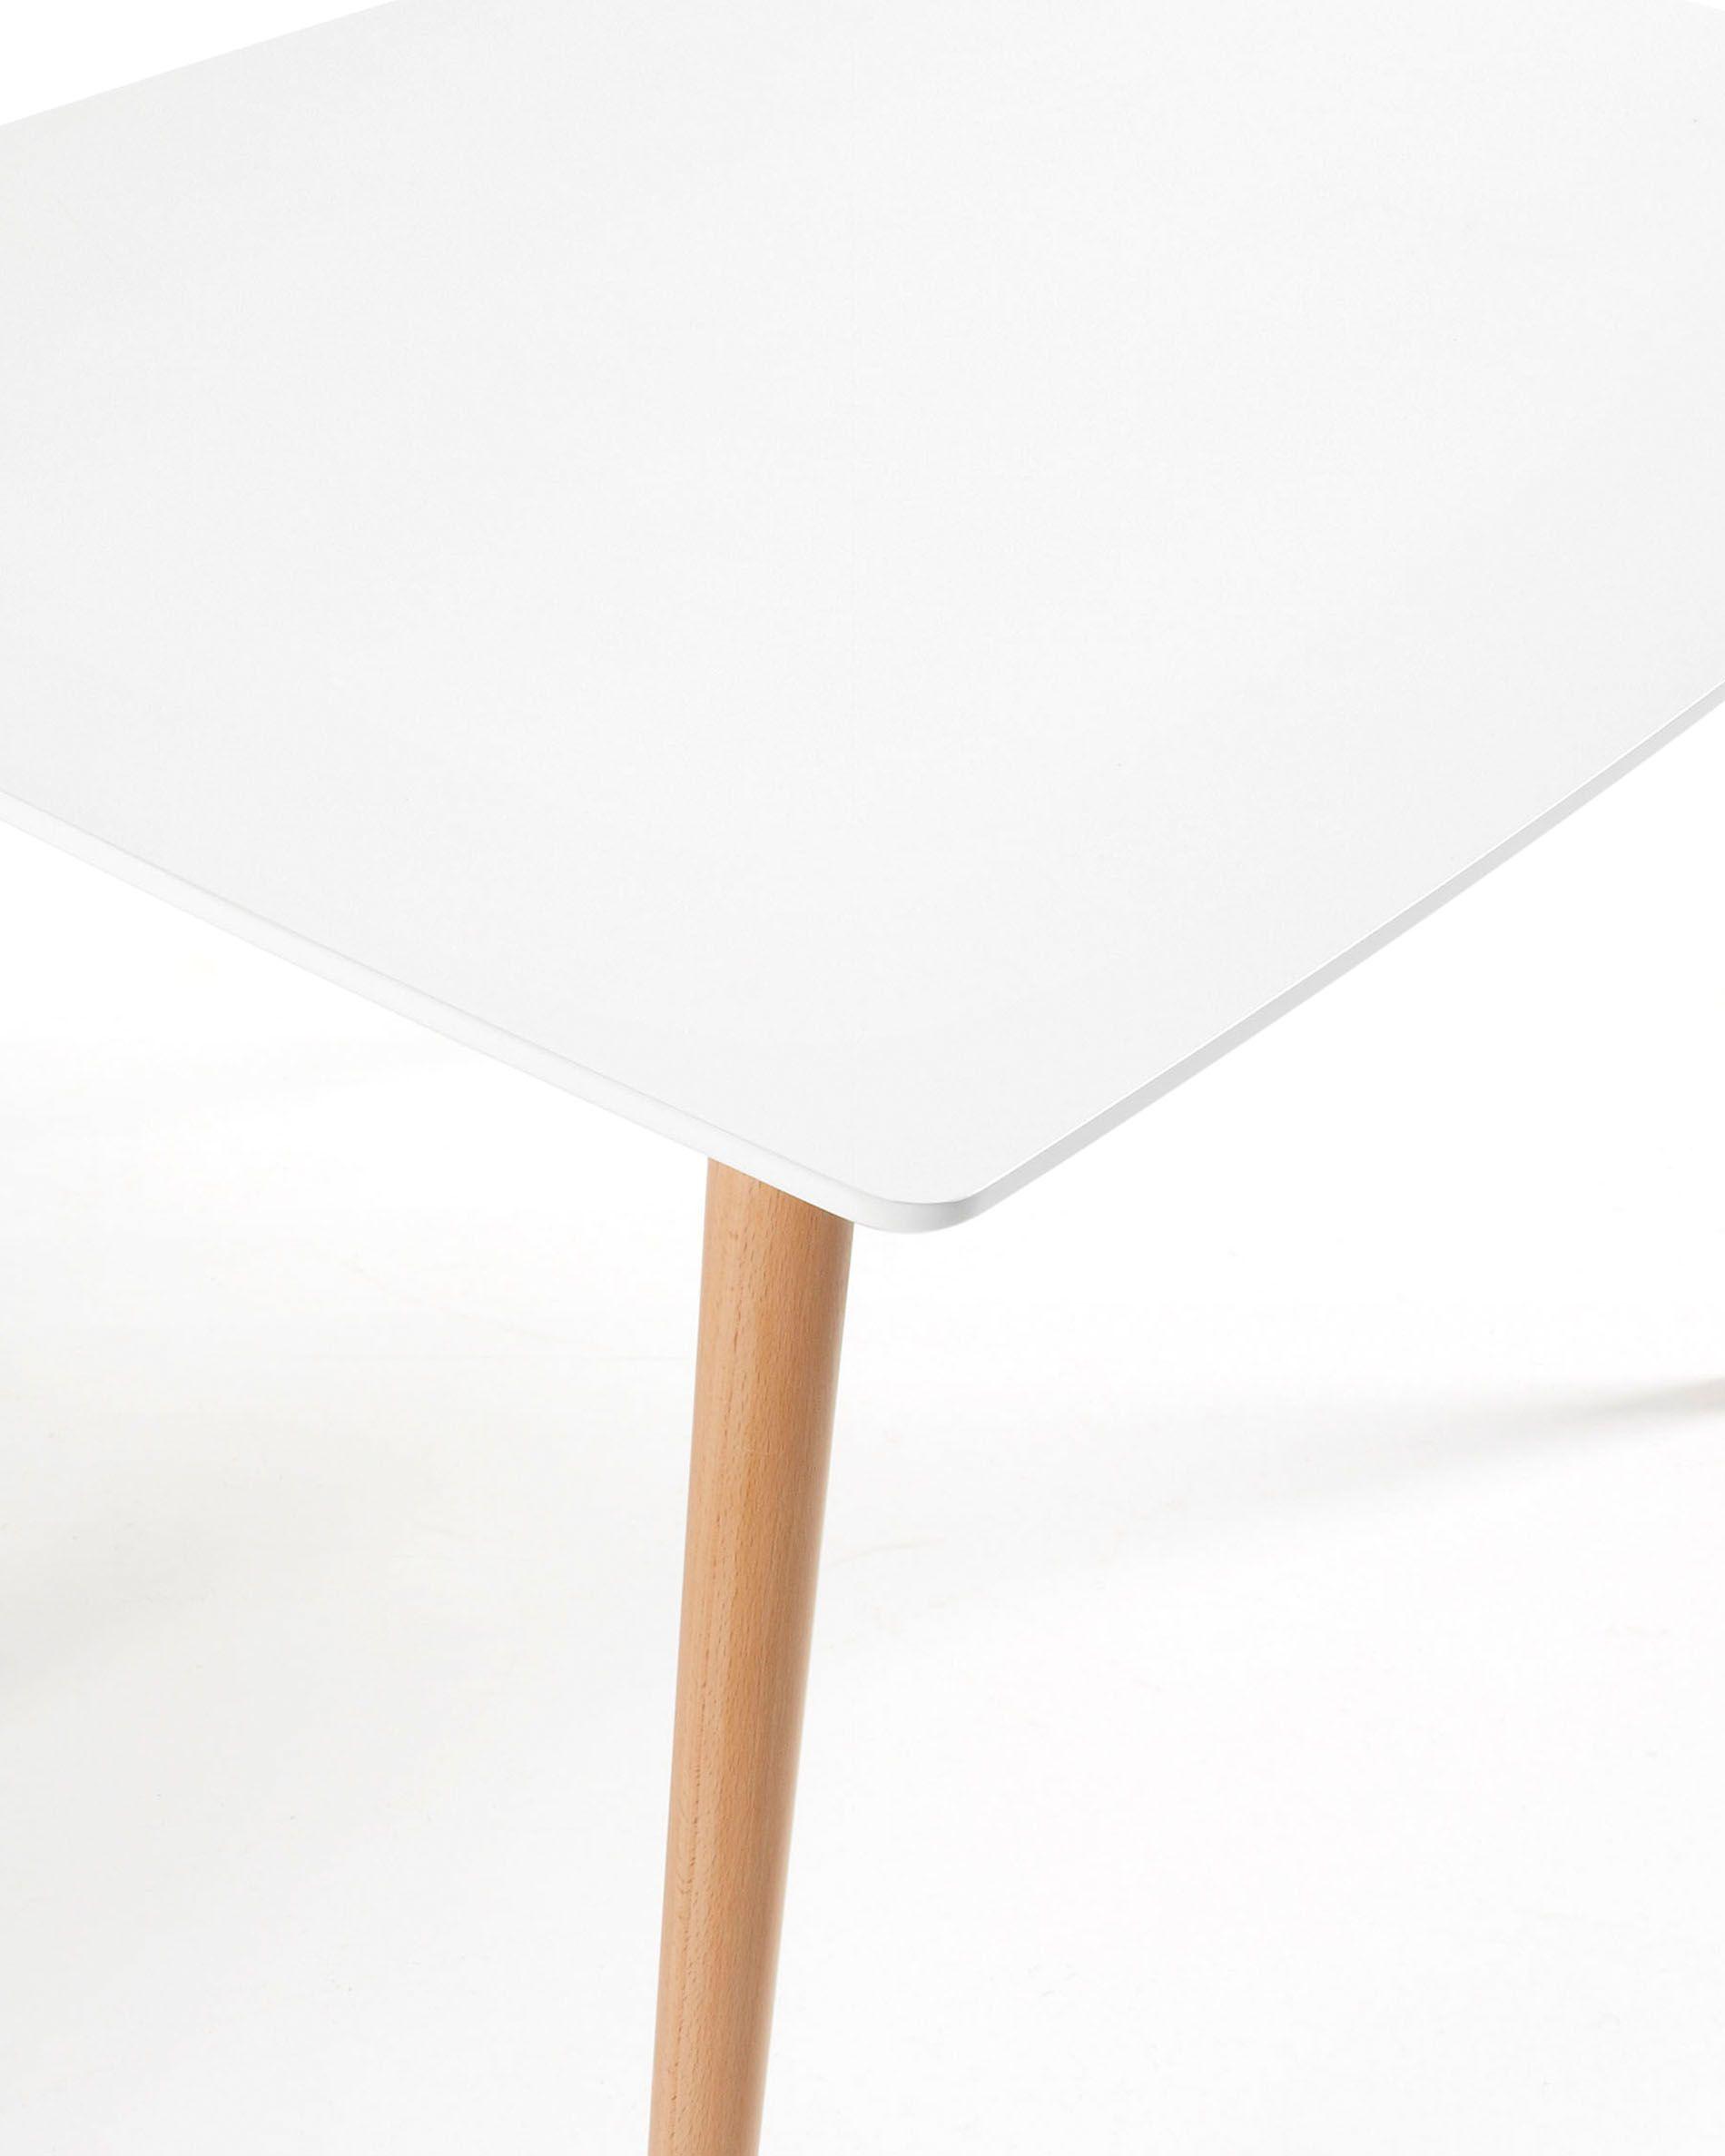 Ensemble Table Ronde Et Chaise Luxe Table Wad 120 X 75 Cm